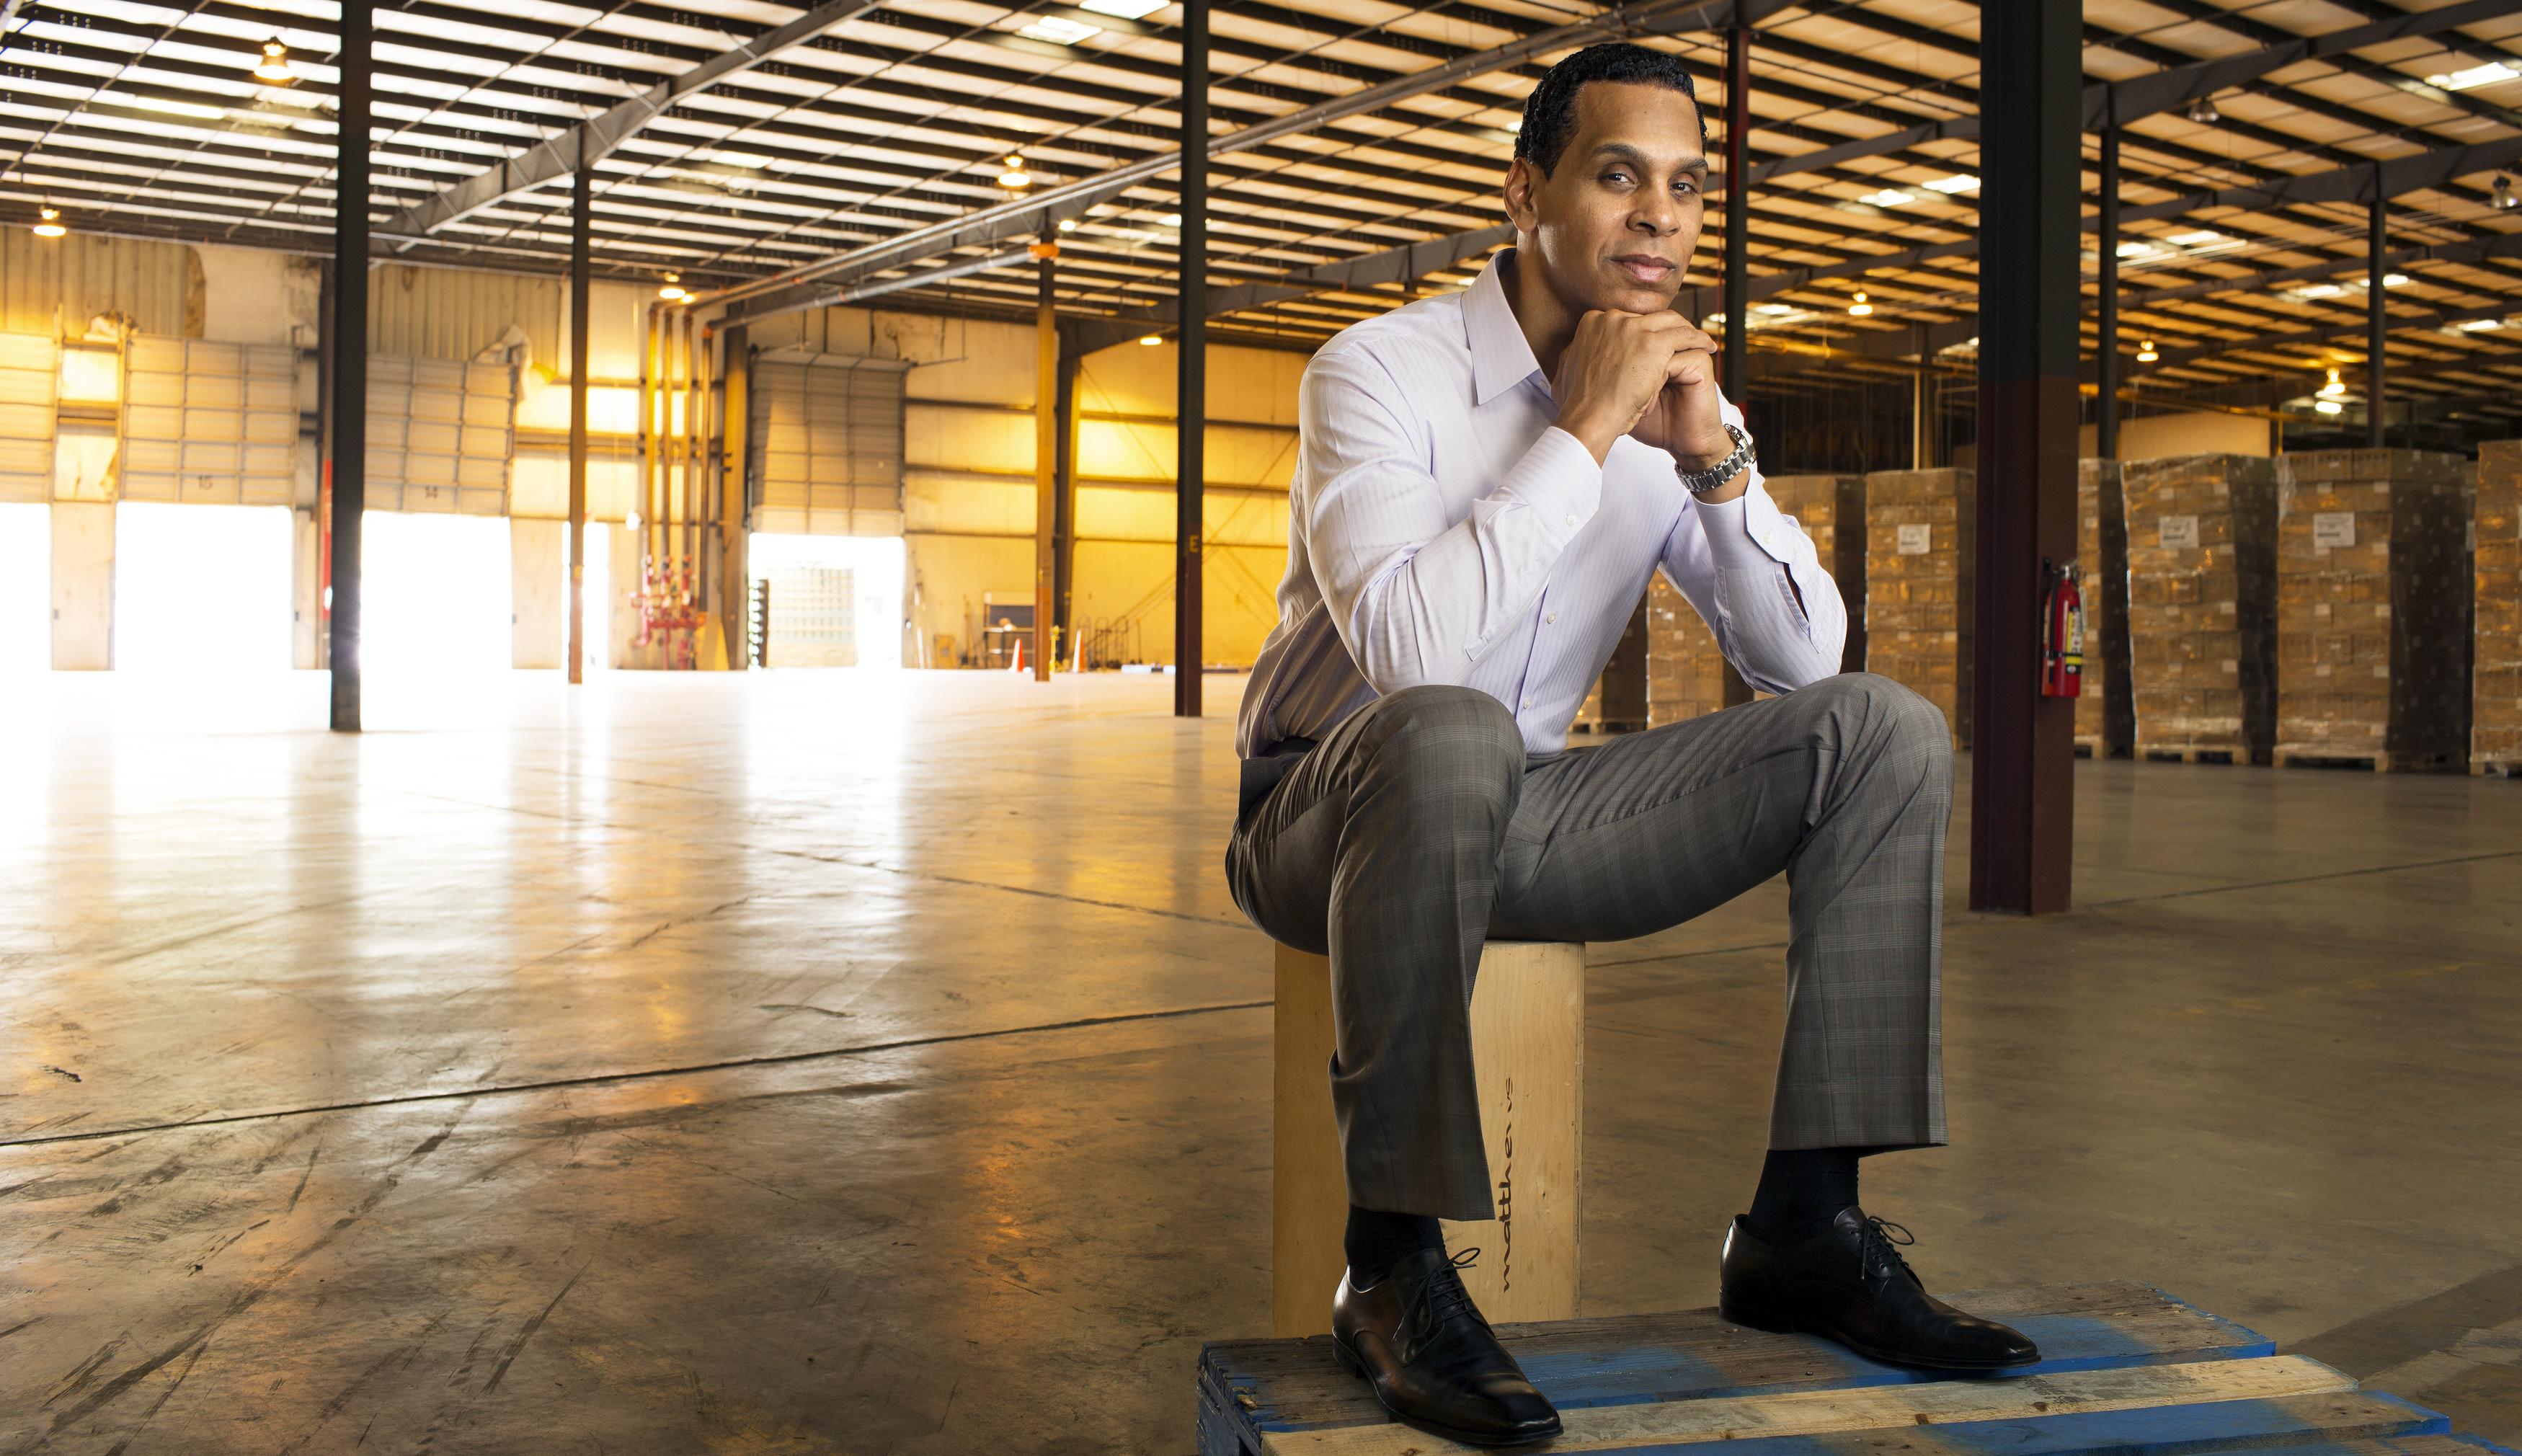 Portrait: Tony McGeePortrait For SI and FortuneIn a warehouse in Orlando, FL/Orlando, FL, USA3/5/2015X159332 TK1Credit: Ben Van Hook